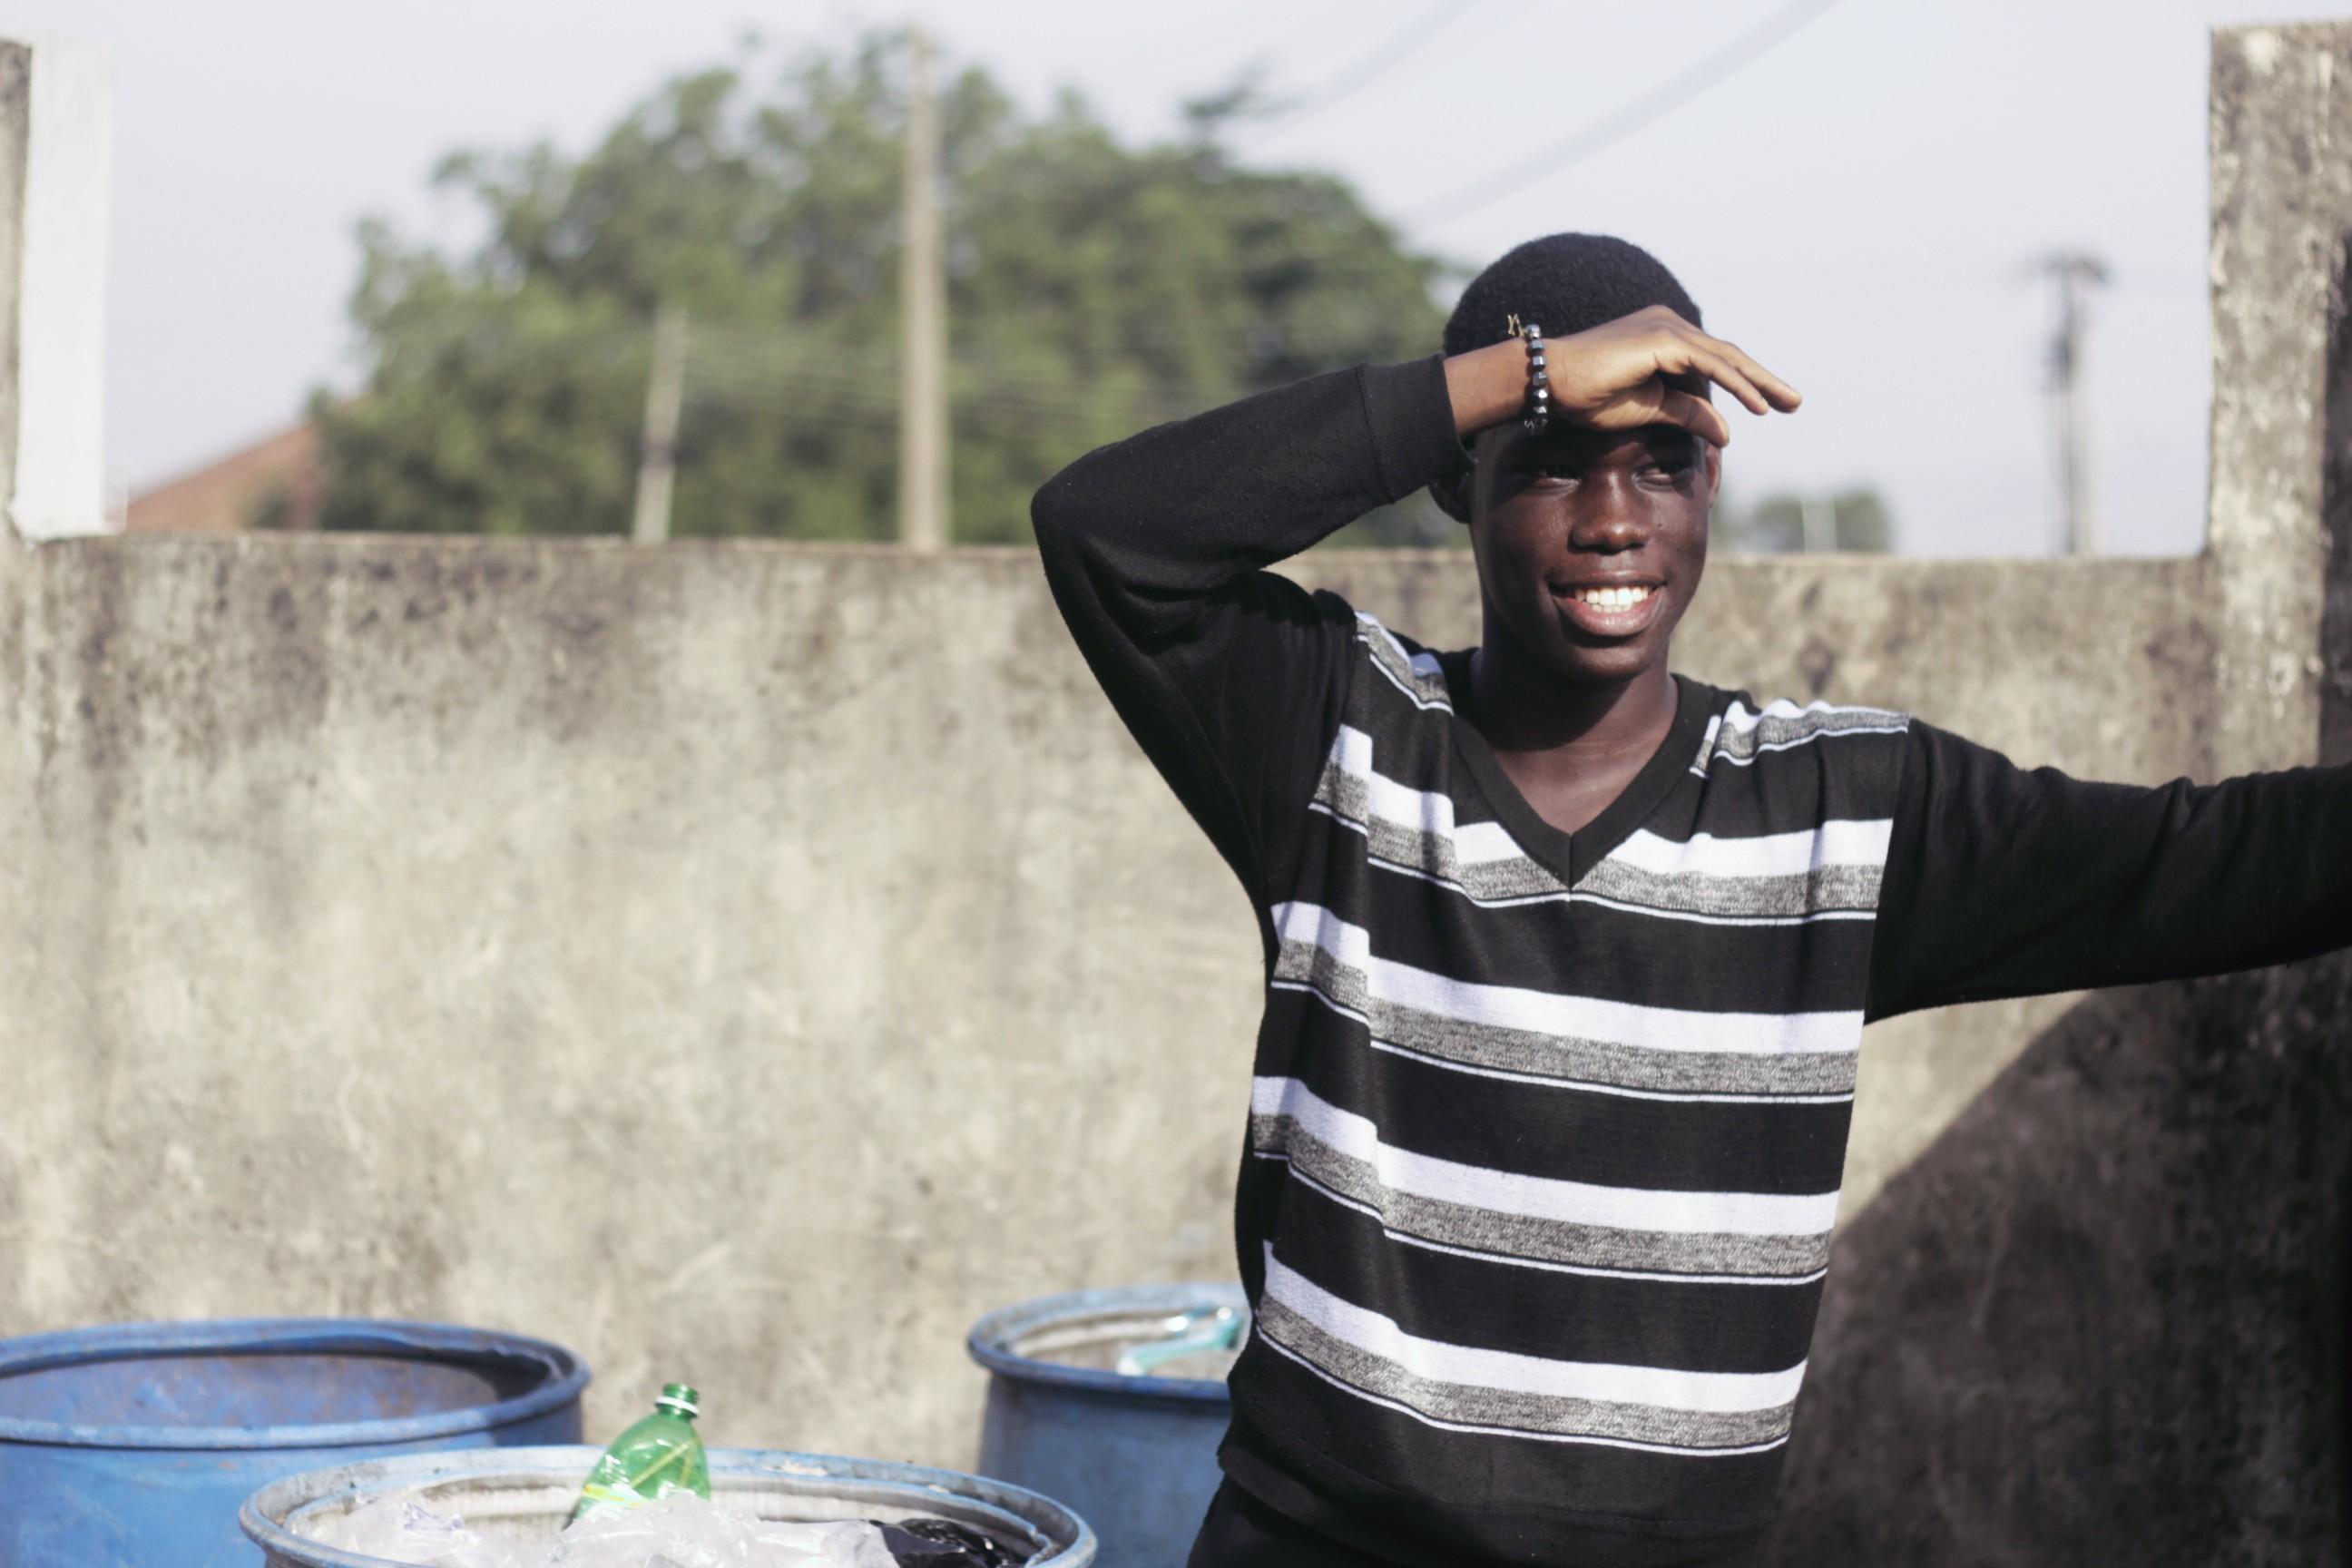 Student Entreprenuer in Nigeria David Adeyemi